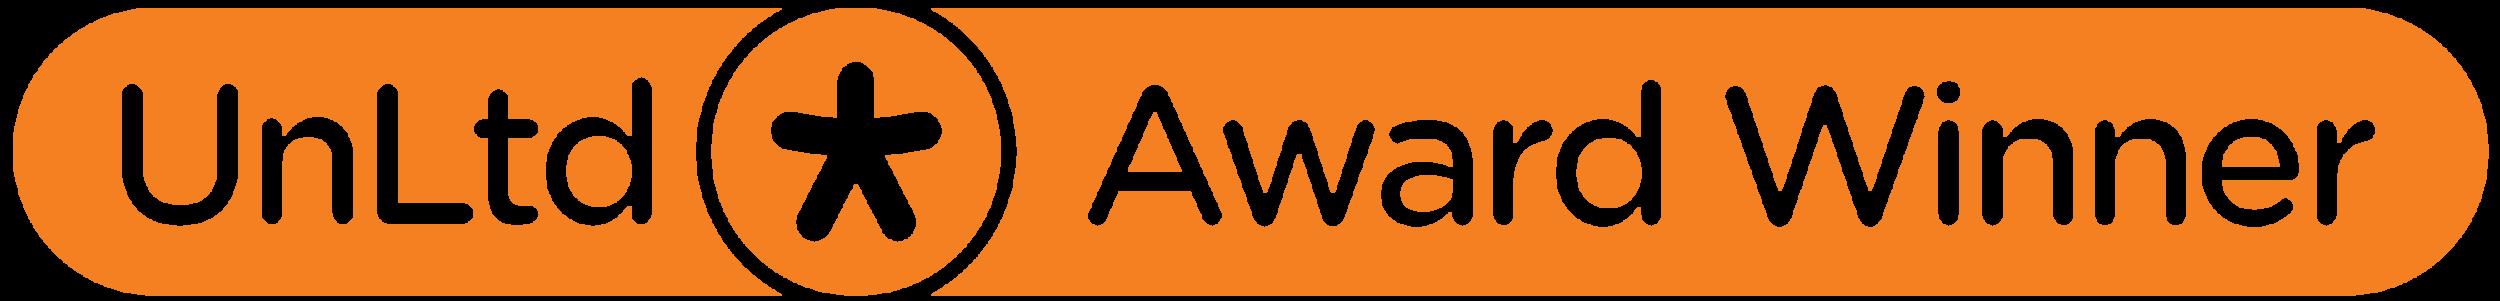 UnLtd-AwardWinner_Orange_3000px.png